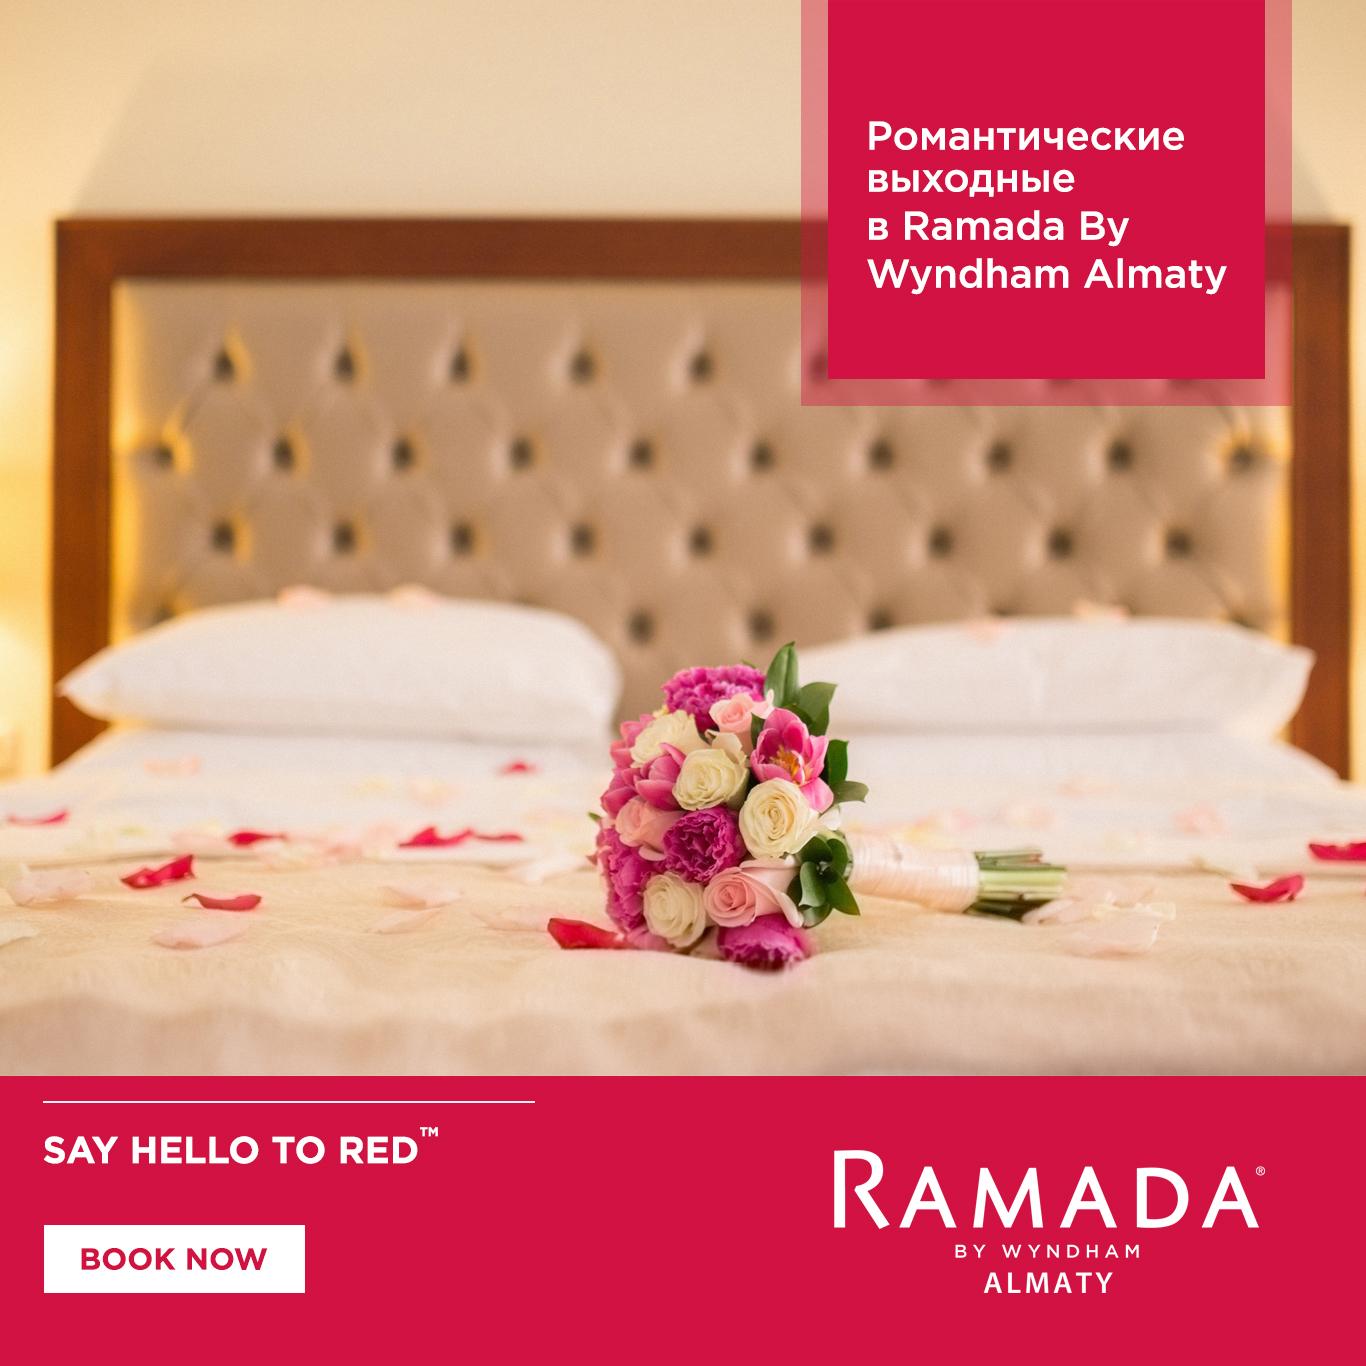 romantic weeked website banner